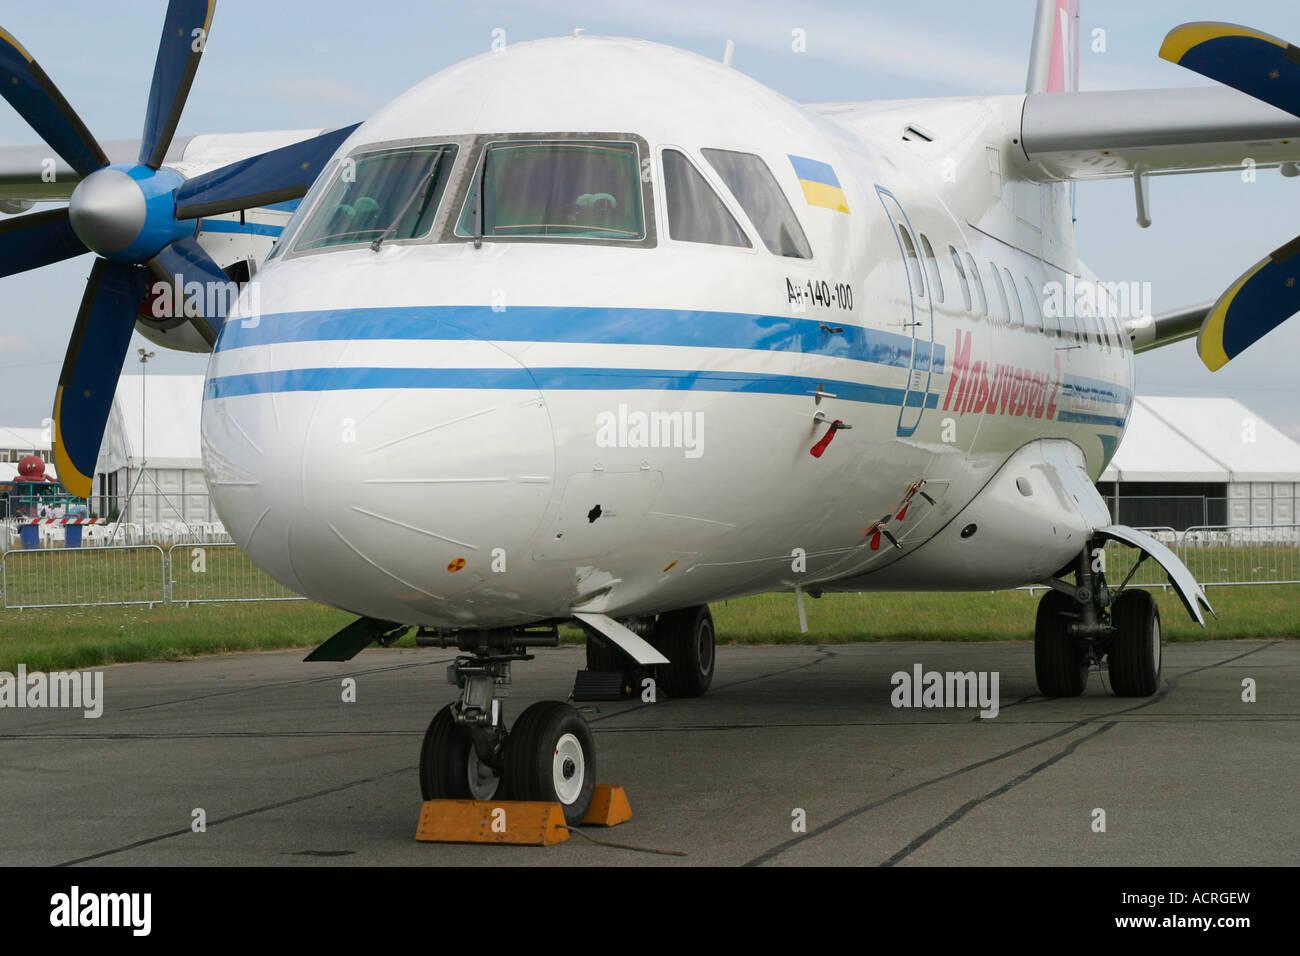 Short range turboprop airliner Antonov An-140 - Stock Image